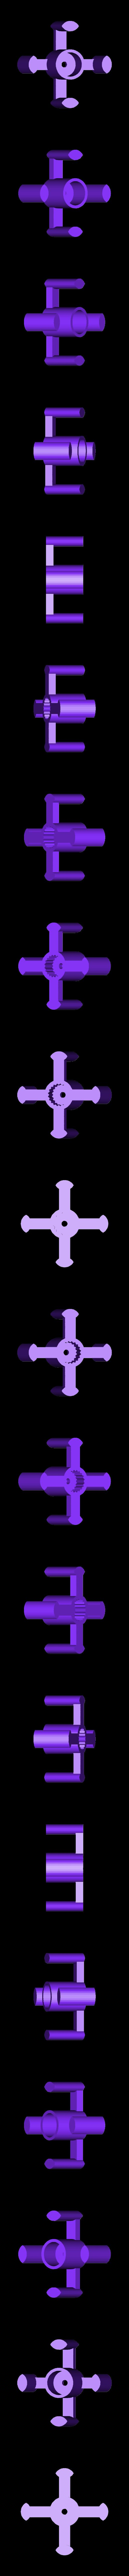 omni-servo-mount.stl Download free STL file Omniwheel x 3 robot frame and mounts • 3D printing object, AlbertKhan3D